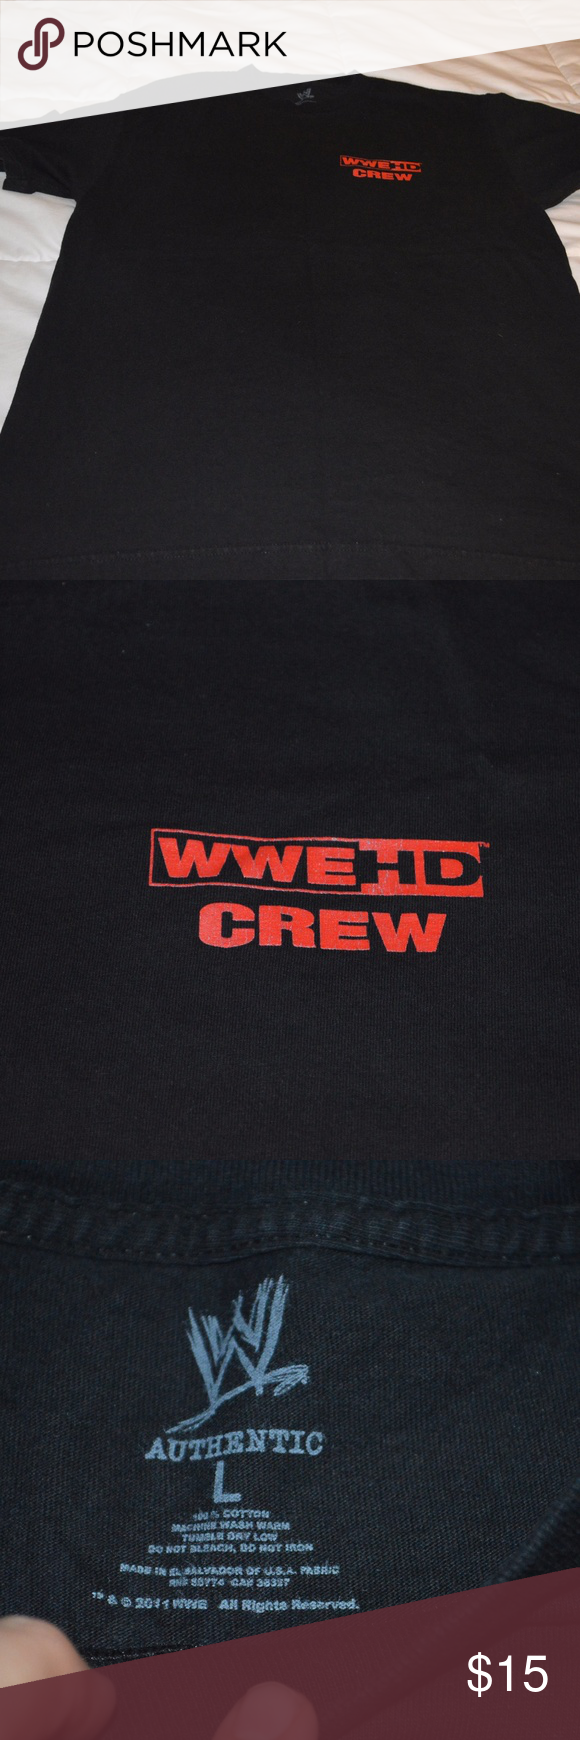 WWE Employee Tee HD Crew Graphic Fall Tour 2011 I work as